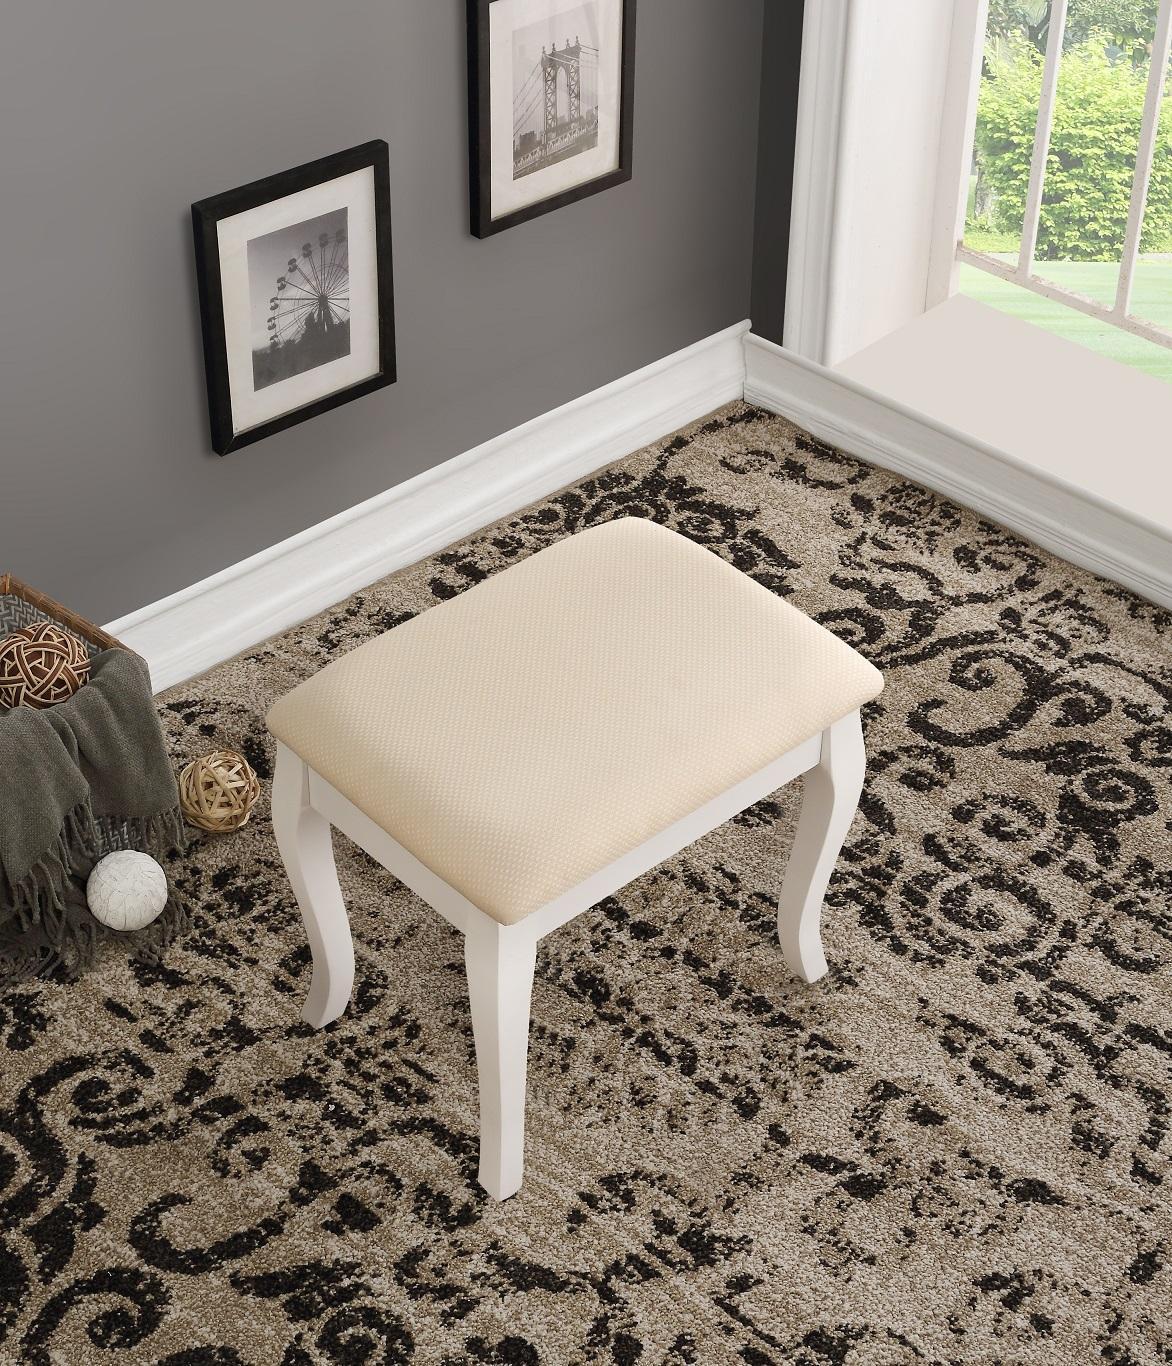 Roundhill Furniture Ashley Wood Make Up Vanity Table And Stool Set White Amazon Ca Home Amp Kitchen